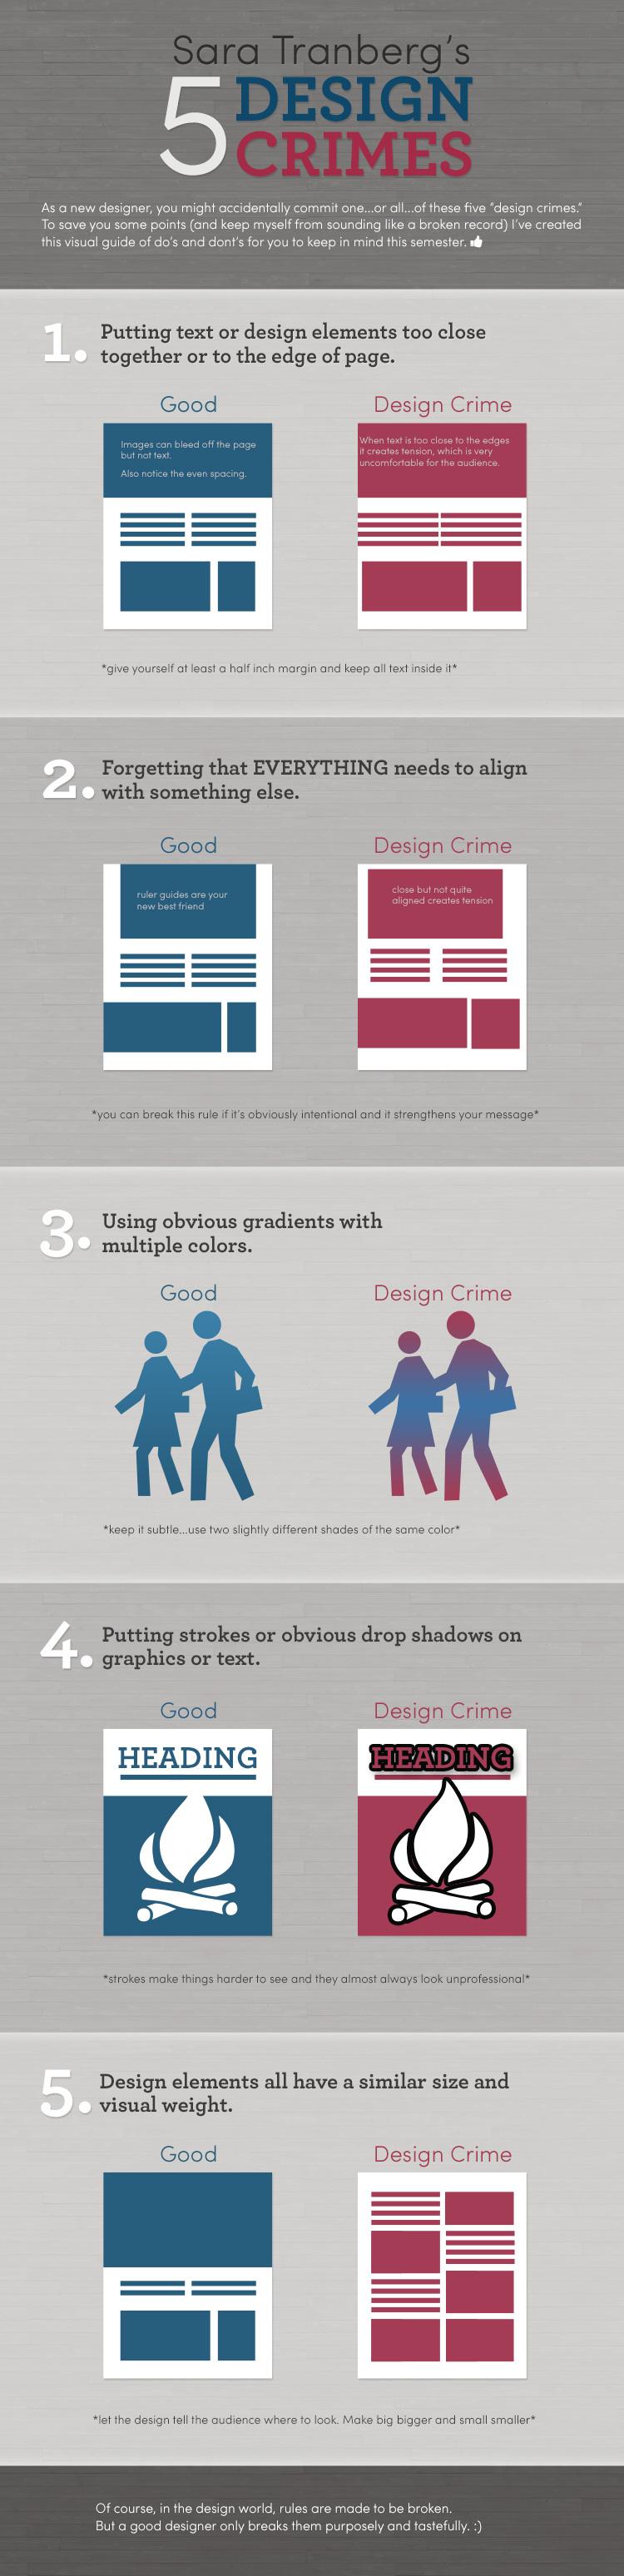 5 Design Crimes infographic